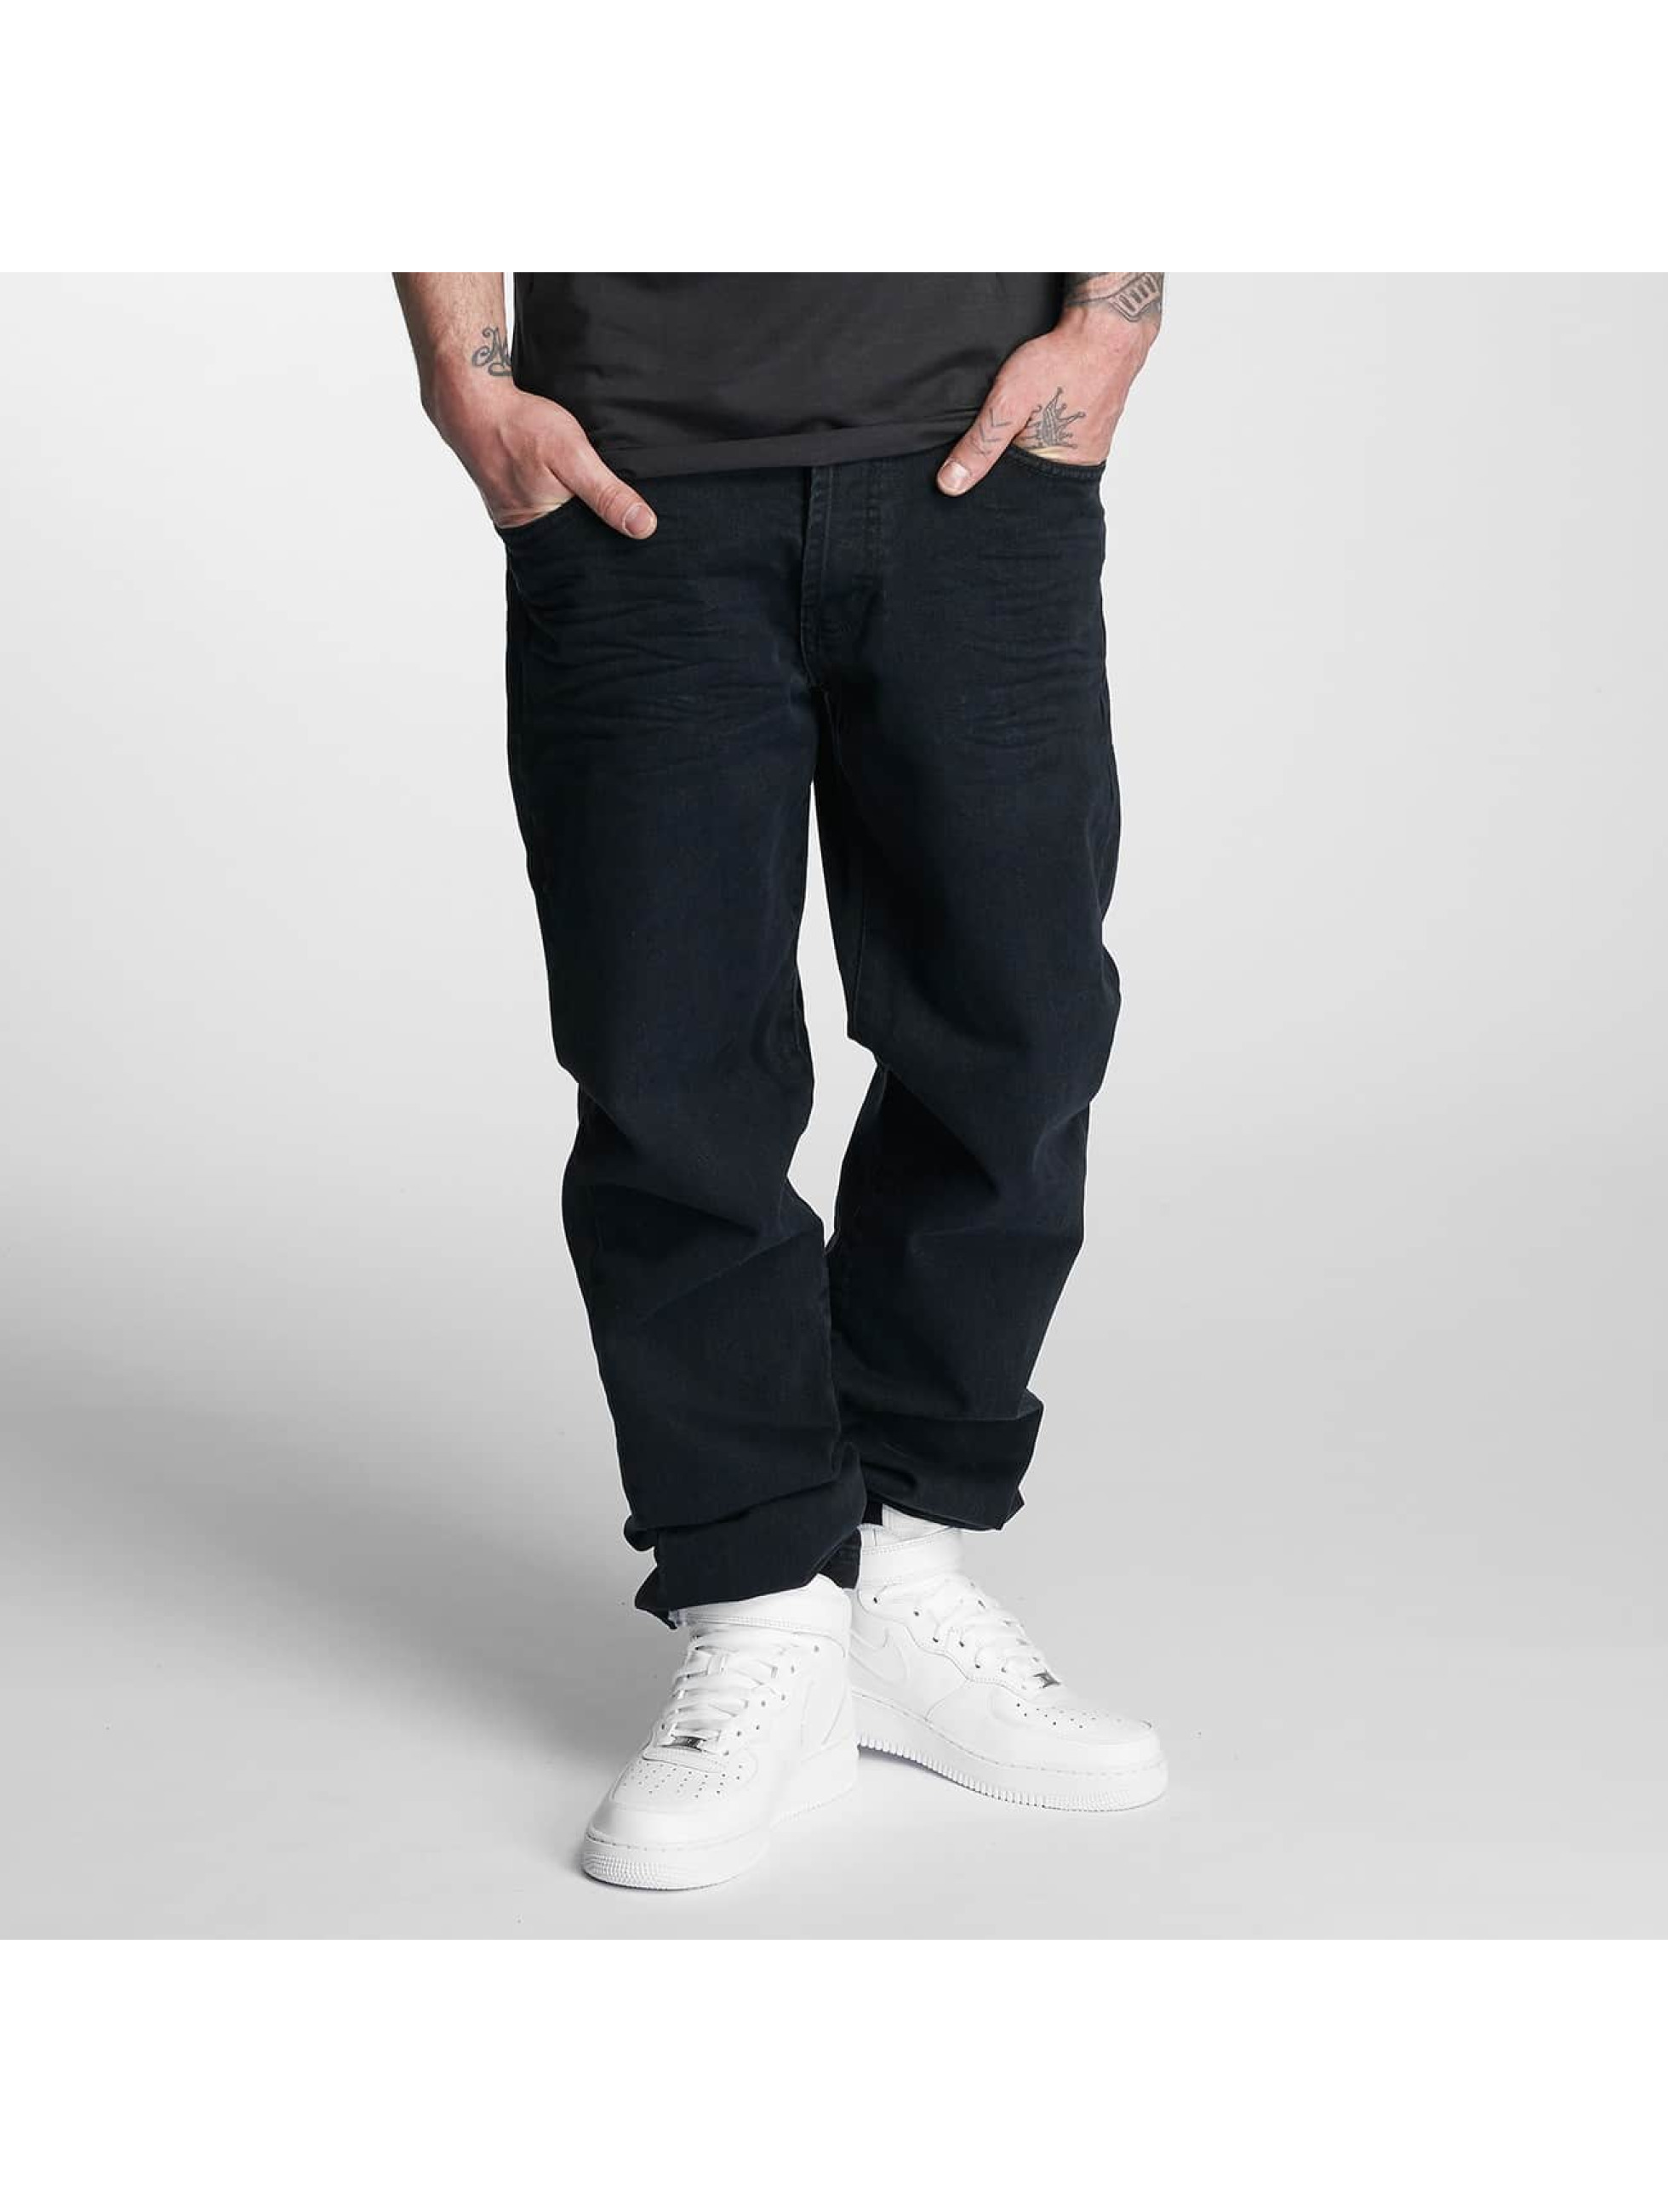 Thug Life Loose Fit Jeans Carrot czarny